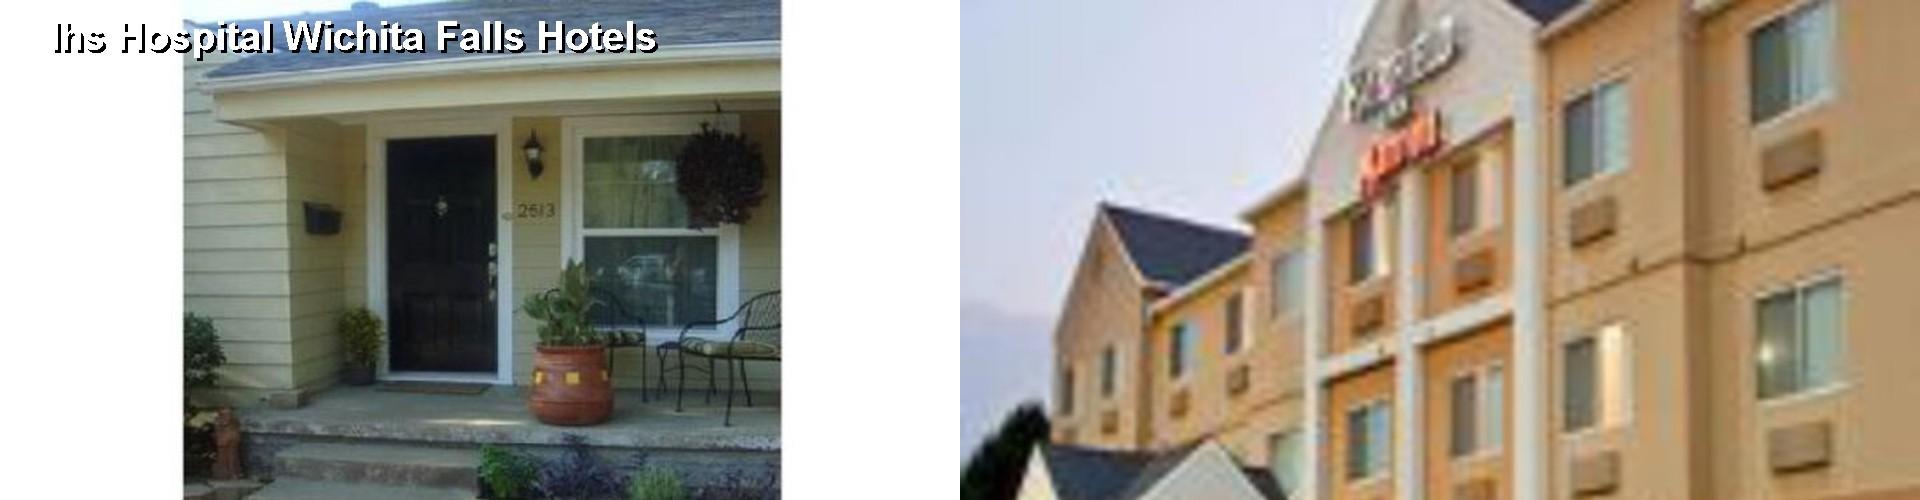 4 Best Hotels Near Ihs Hospital Wichita Falls